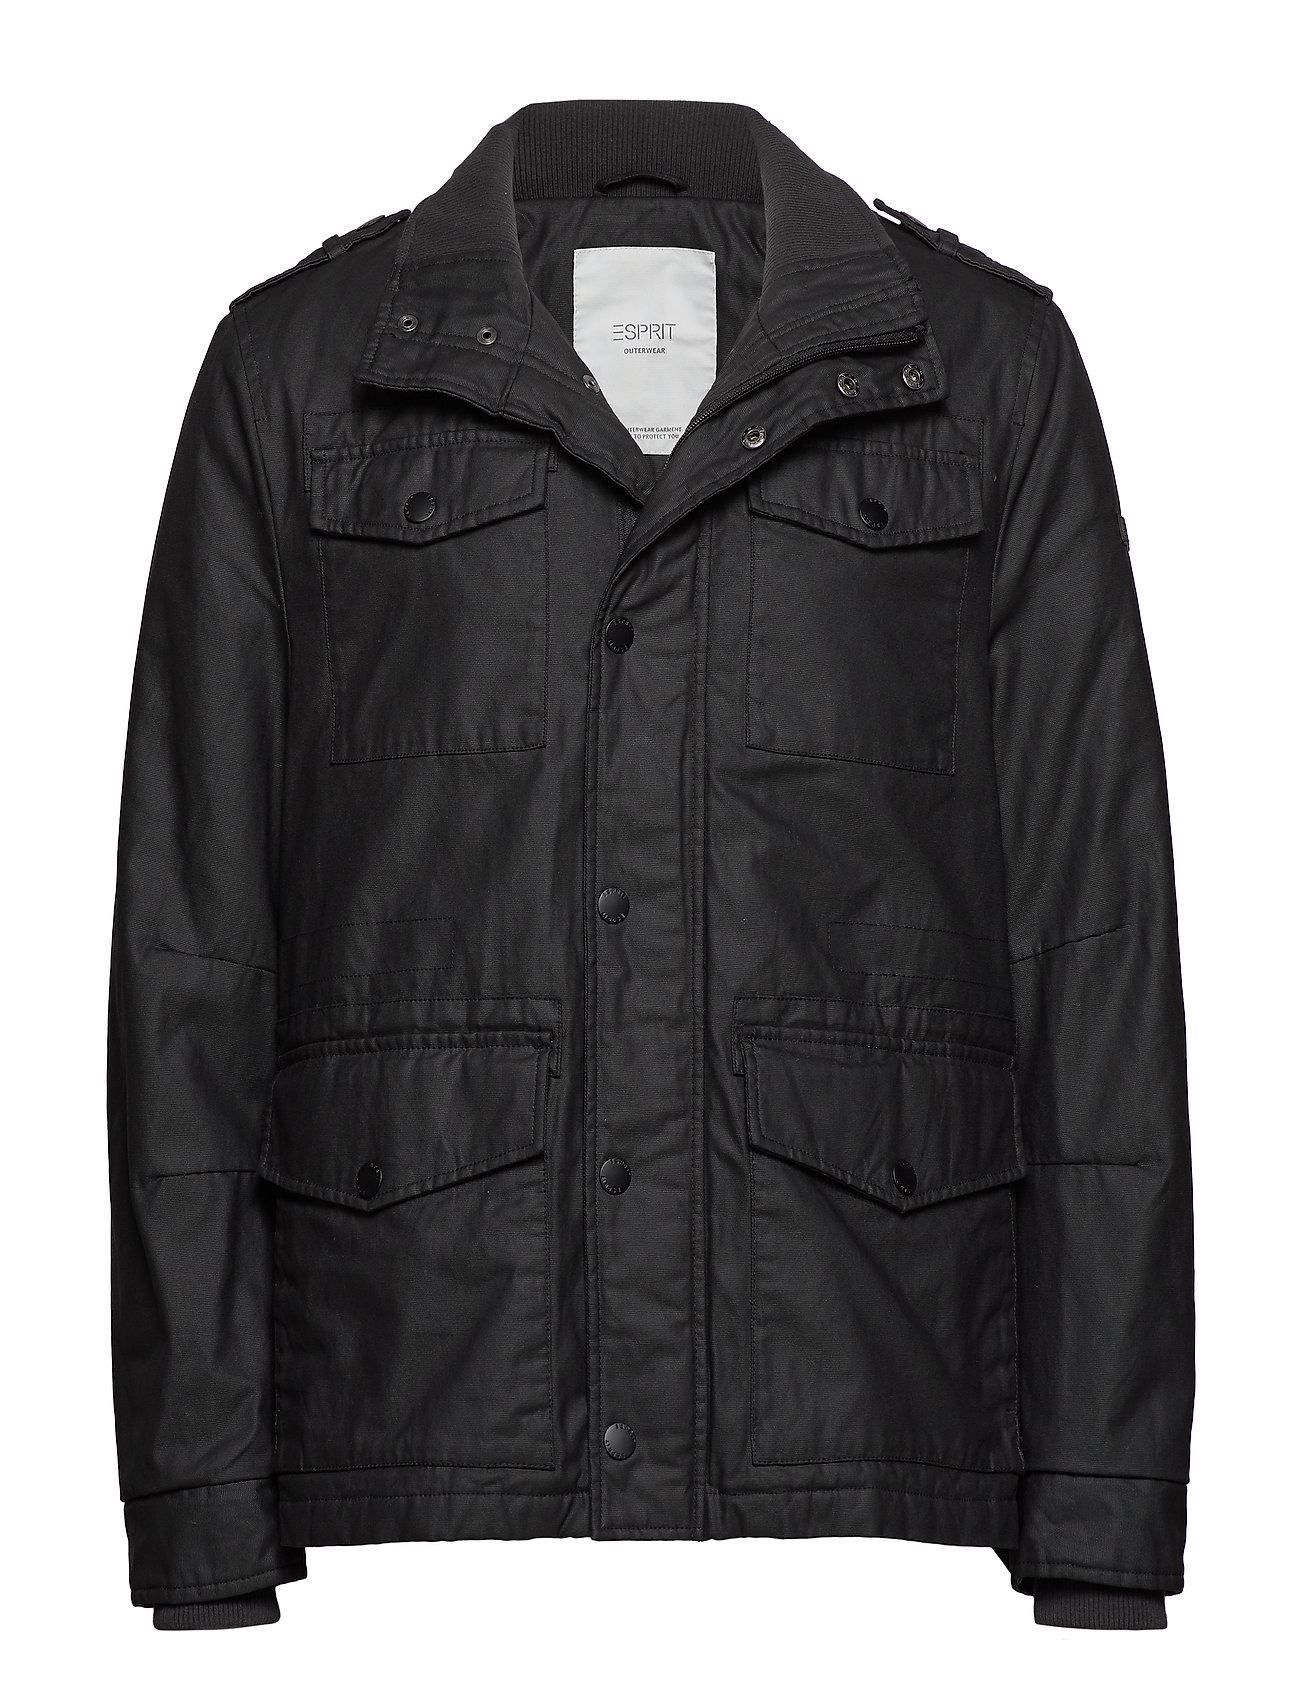 ESPRIT Jackets Outdoor Woven Dünne Jacke Schwarz ESPRIT CASUAL